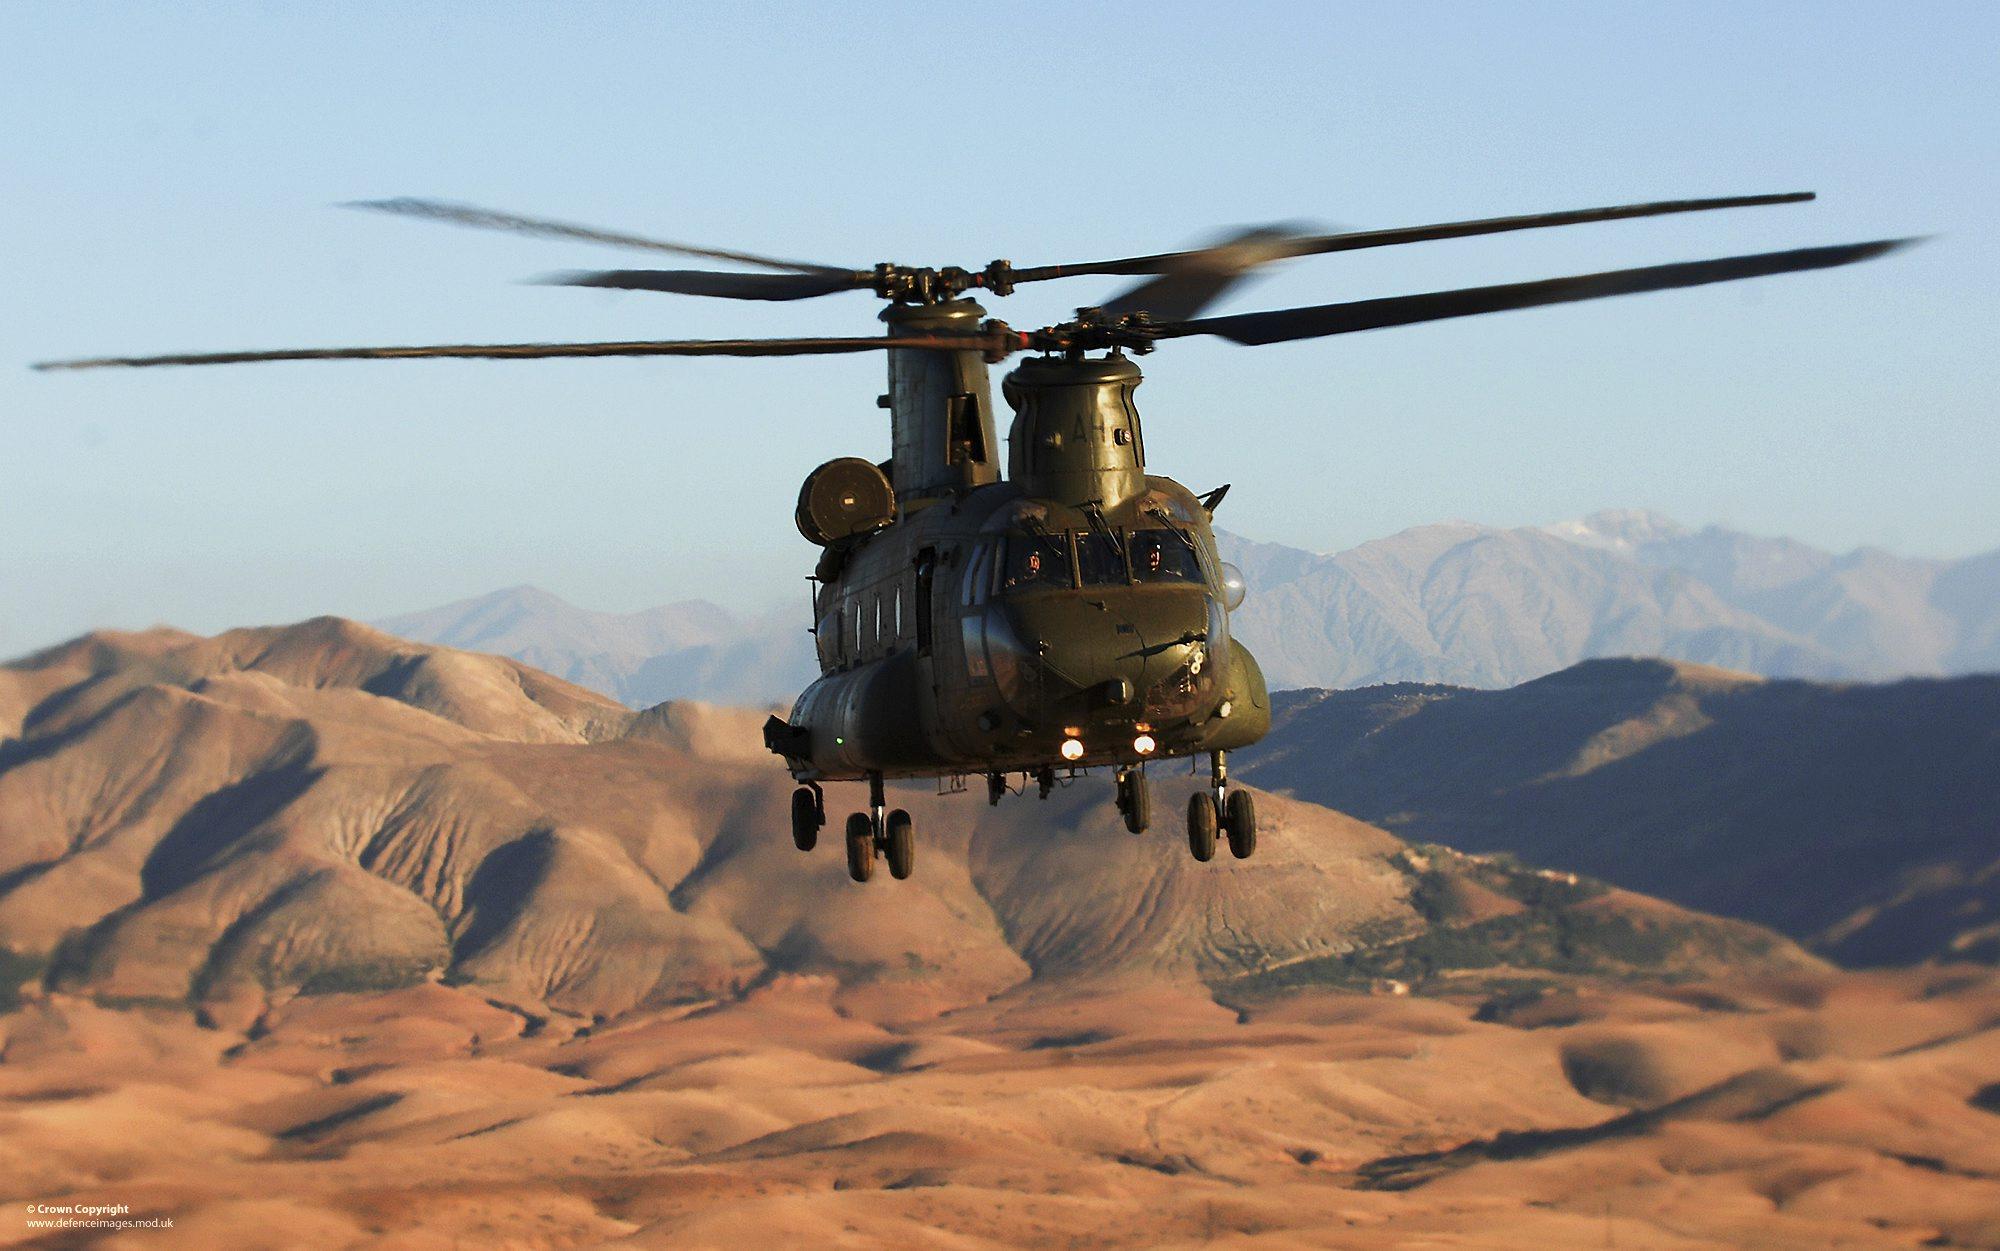 RAF_Chinook_helicopter_over_the_Sahara_Desert.jpg